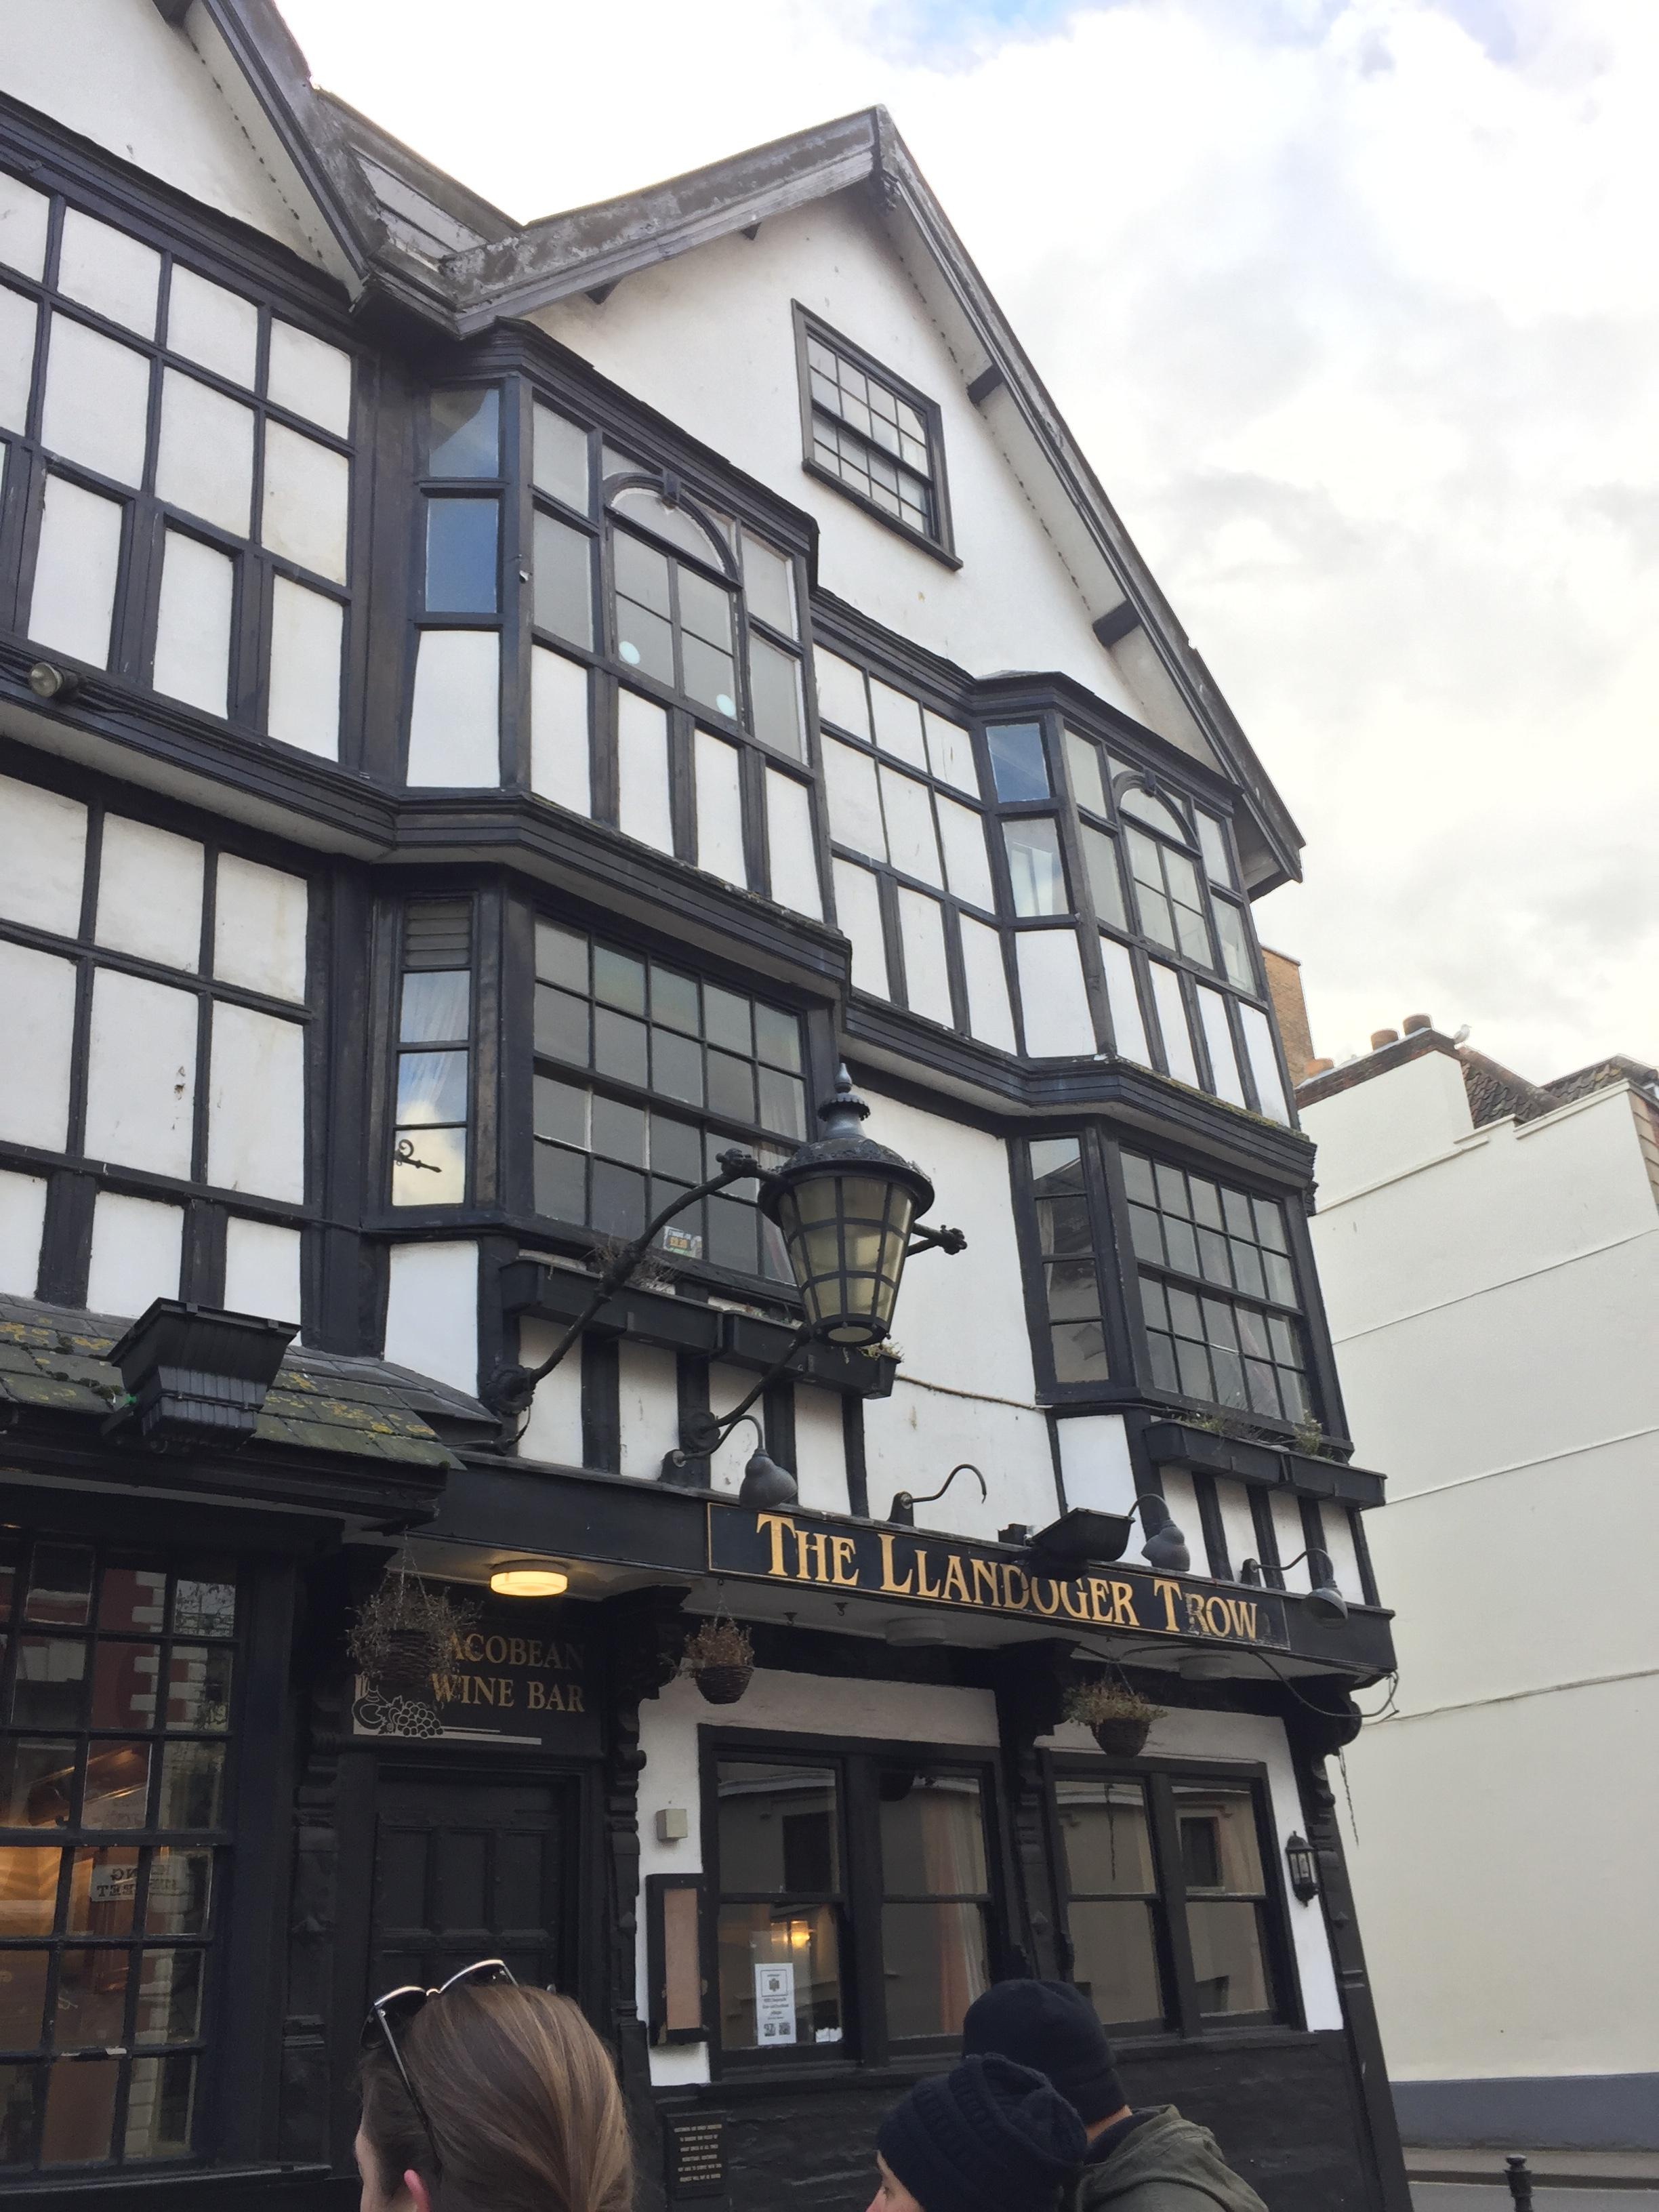 Daniel Defoe found his inspiration for Robinson Crusoe at this pub